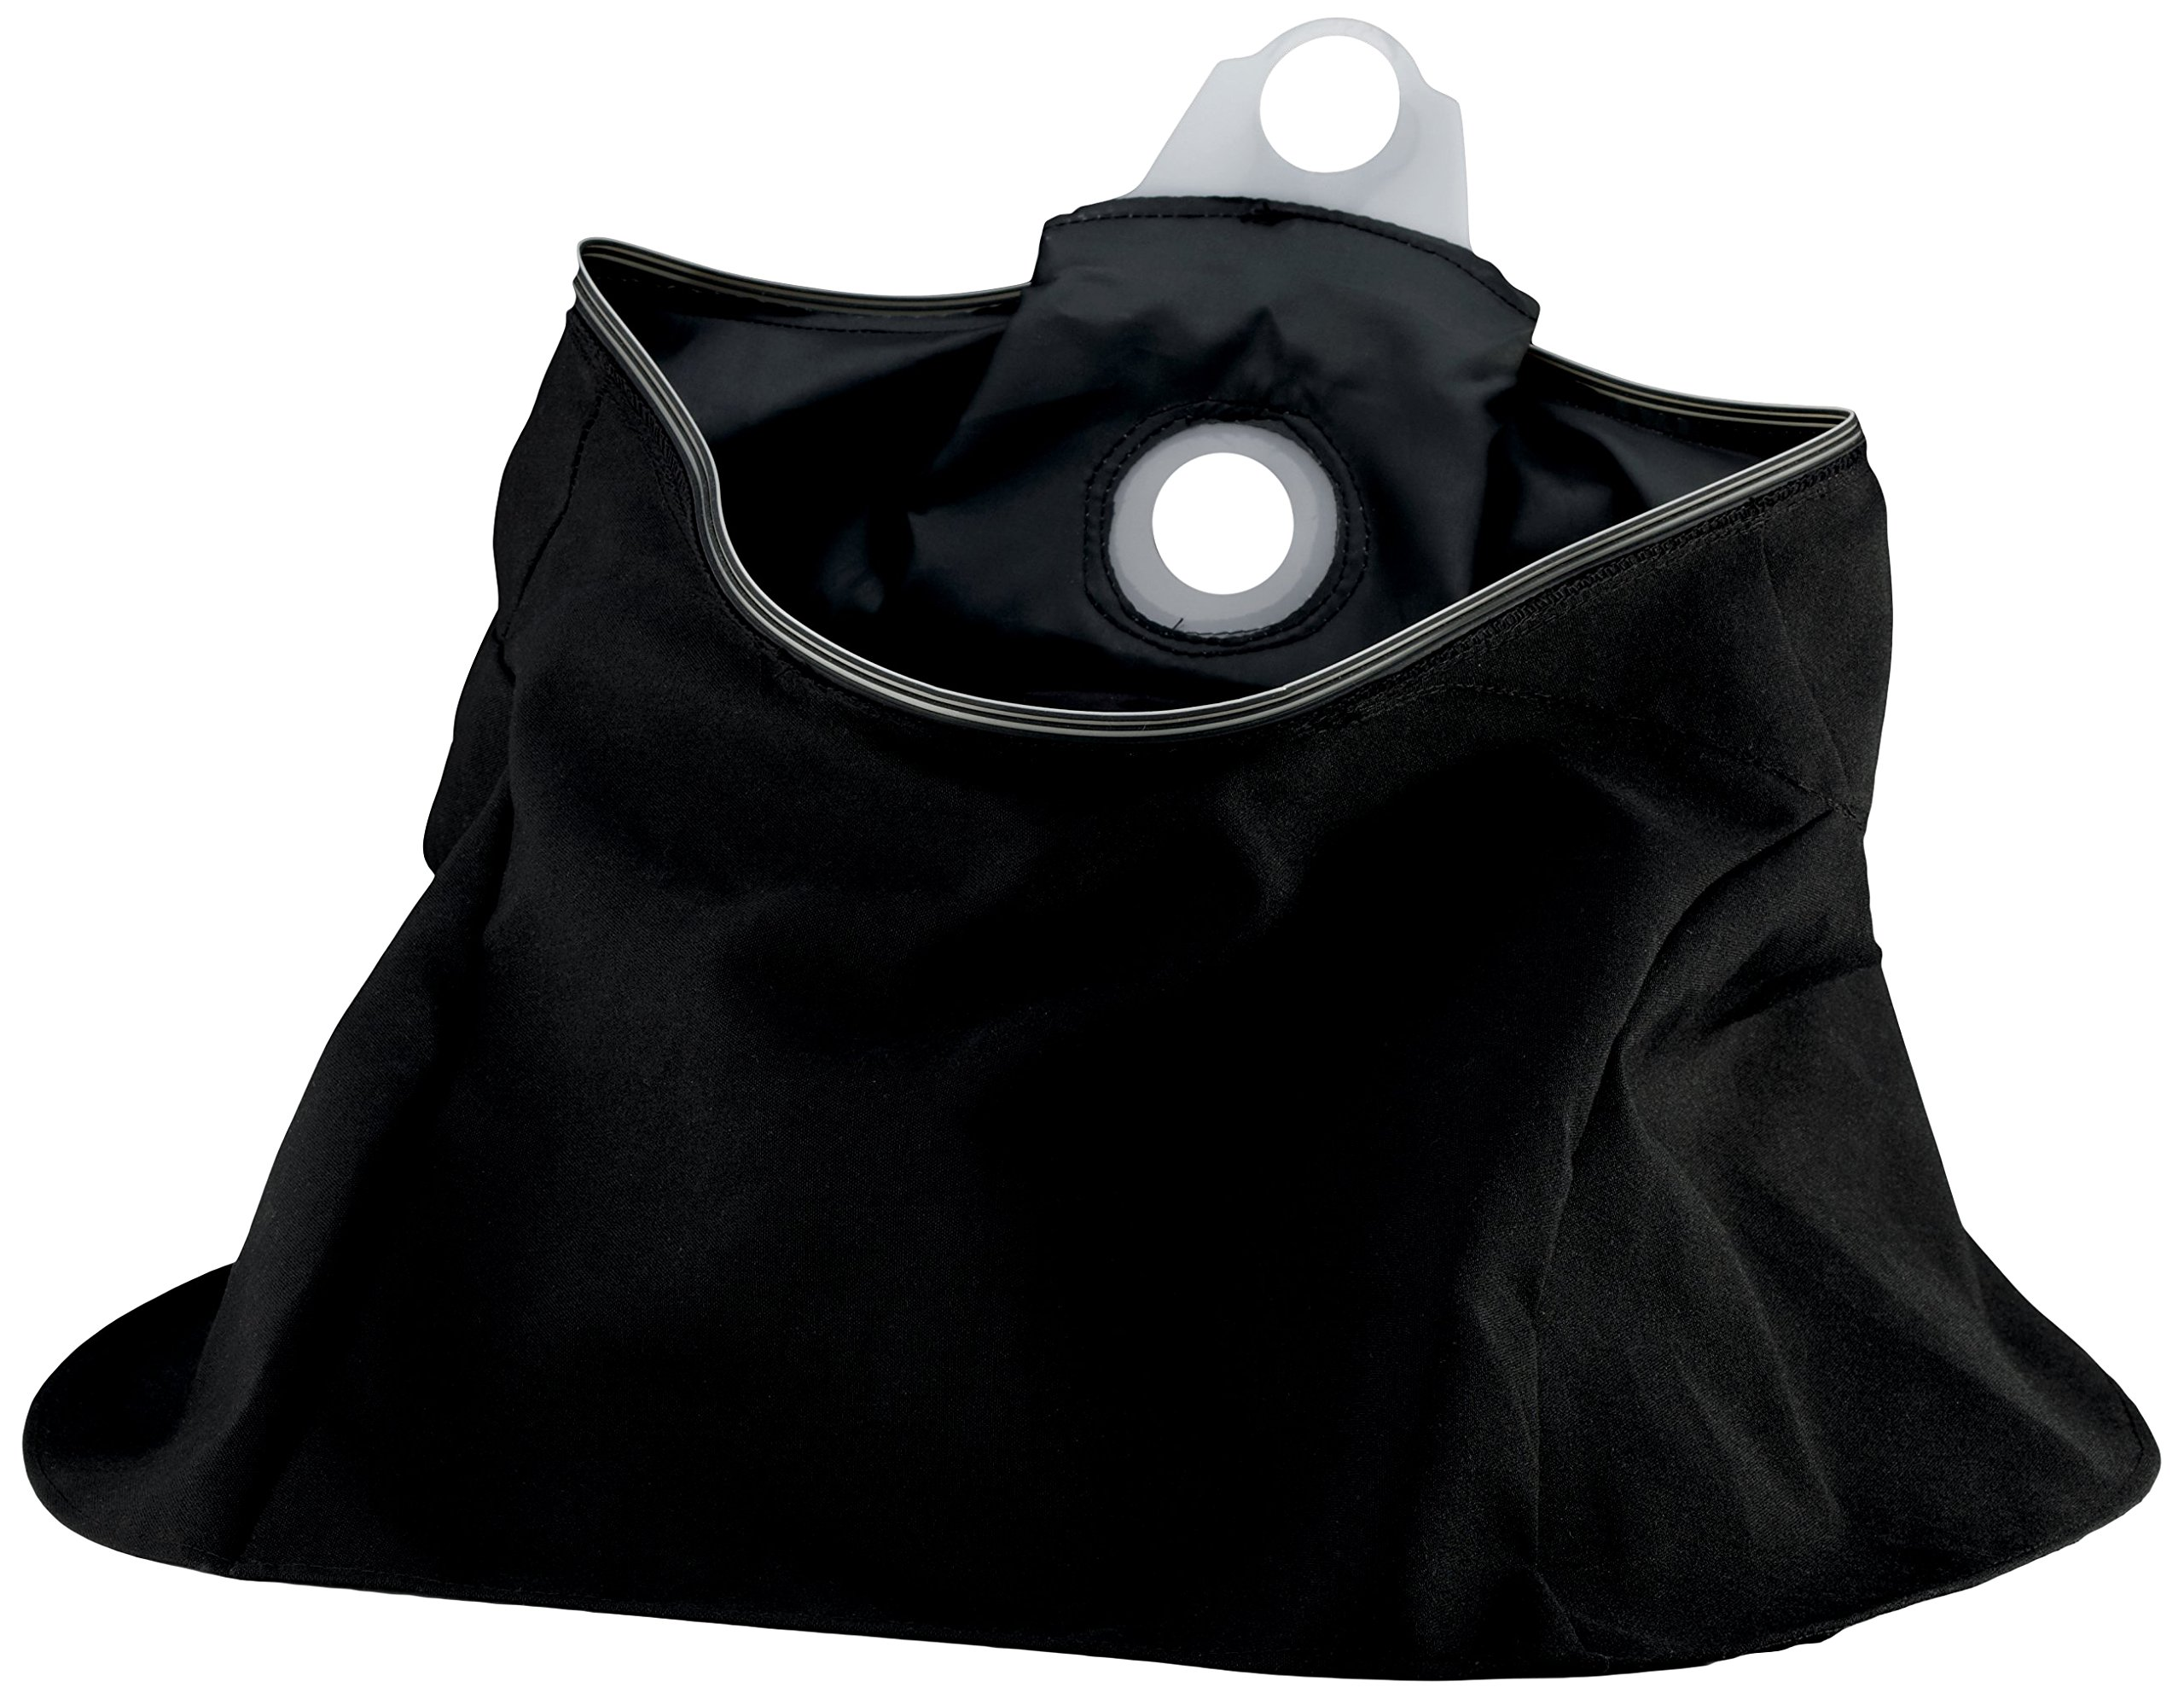 3M Versaflo 17328 M-Series Flame Resistant Outer Shroud M-447, Black by 3M